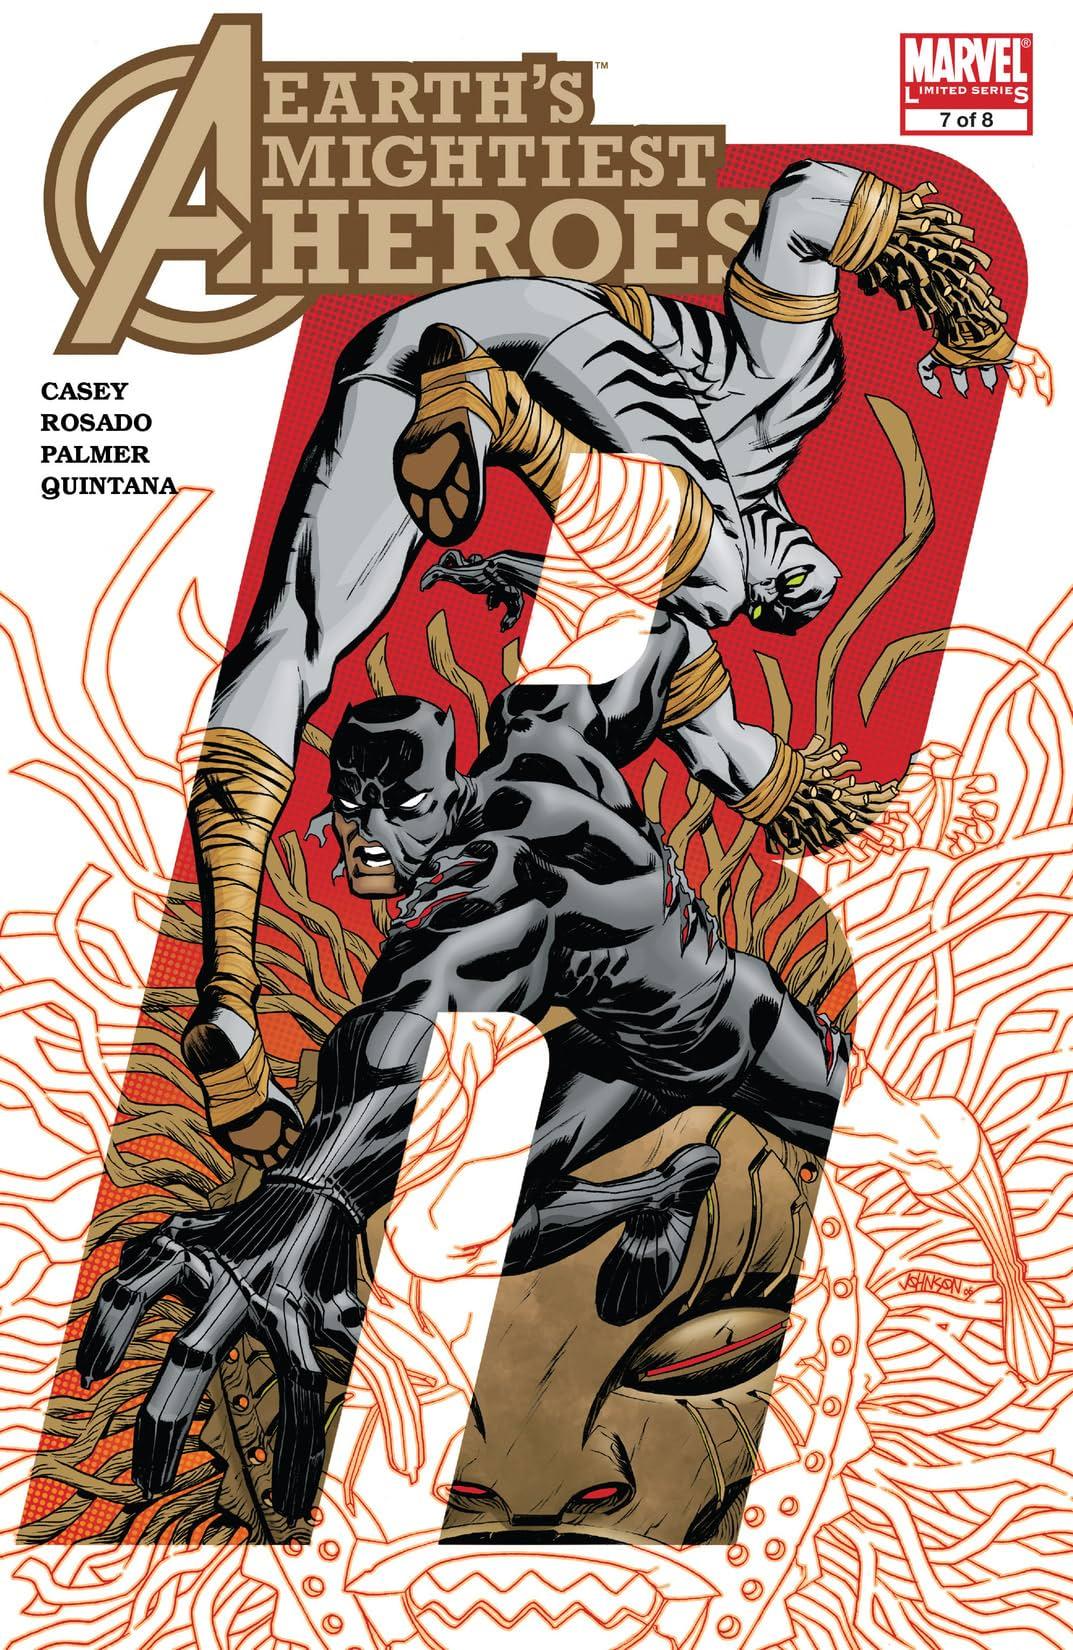 Avengers: Earth's Mightiest Heroes II (2006-2007) #7 (of 8)